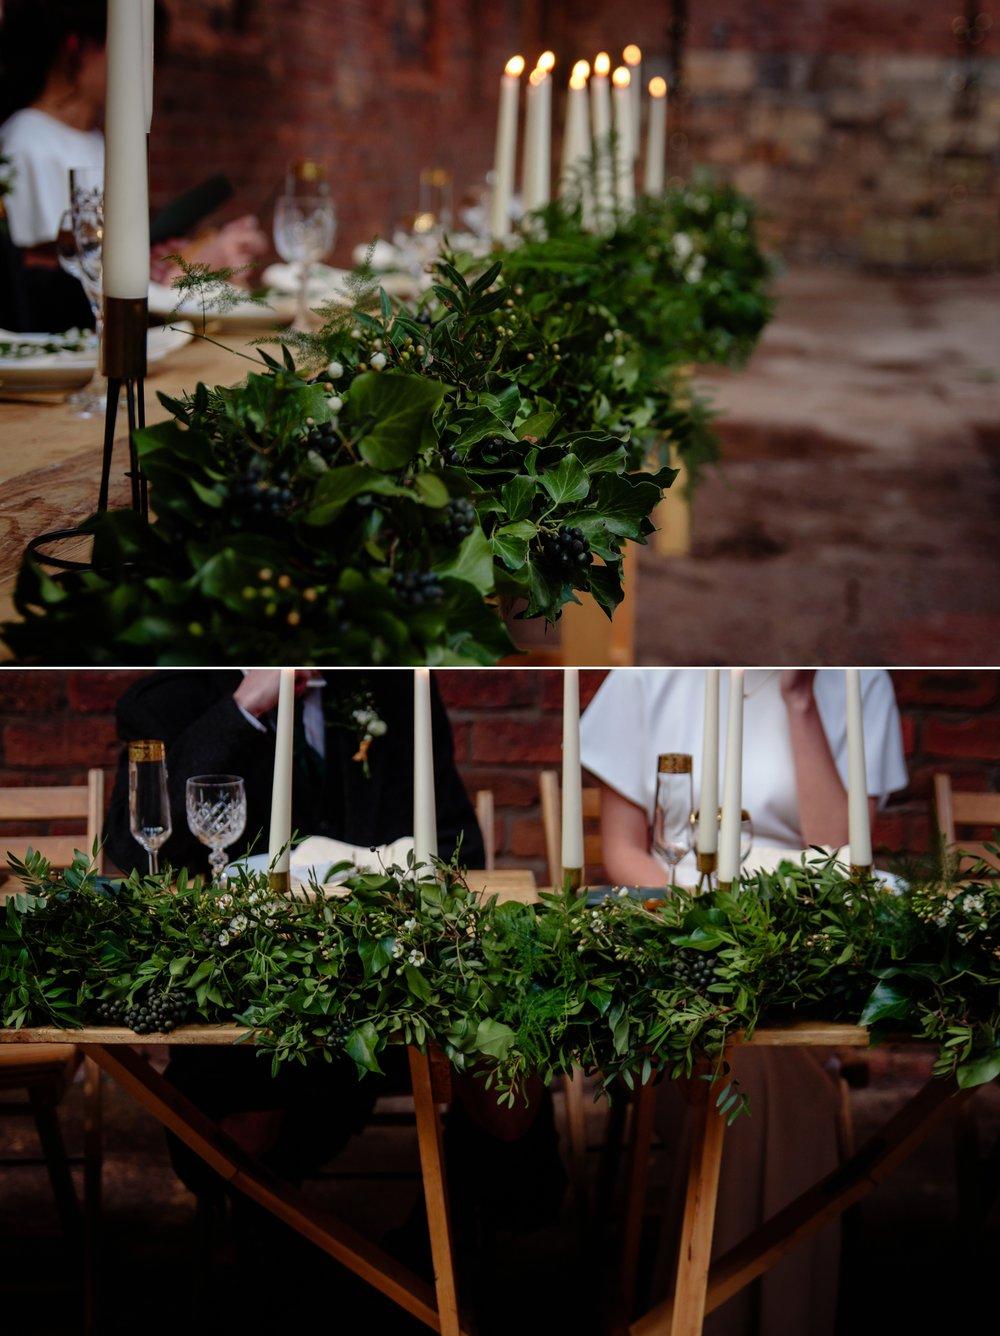 engine-works-wedding-styled-shoot-fotomaki-photography-154.jpg